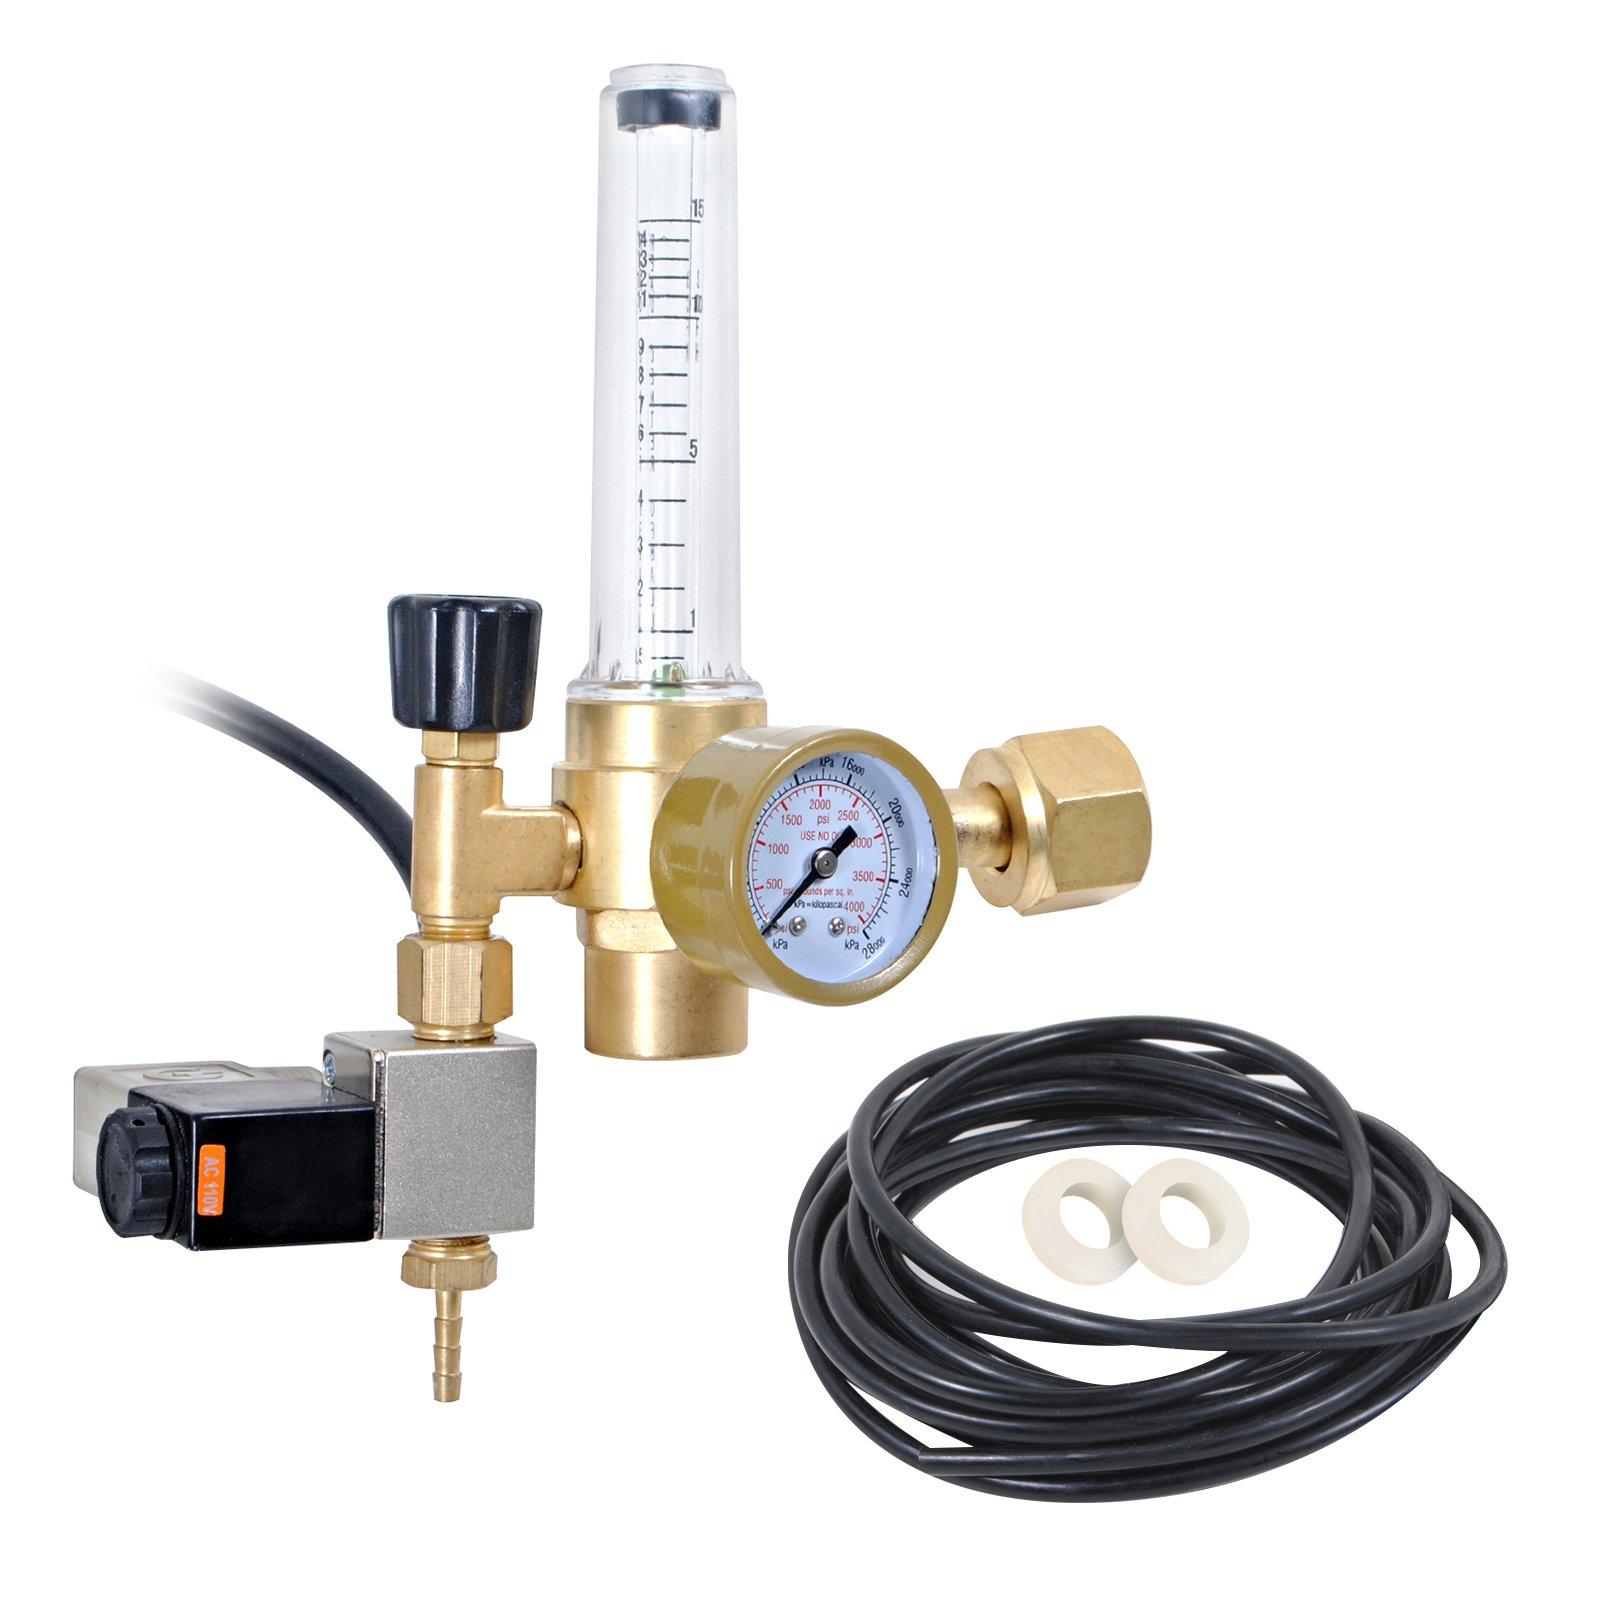 CO2 Regulator with Solenoid Valve and Flow-Meter Emitter. C02 Emitter for Indoor Gardening, Aquariums and Hydroponics